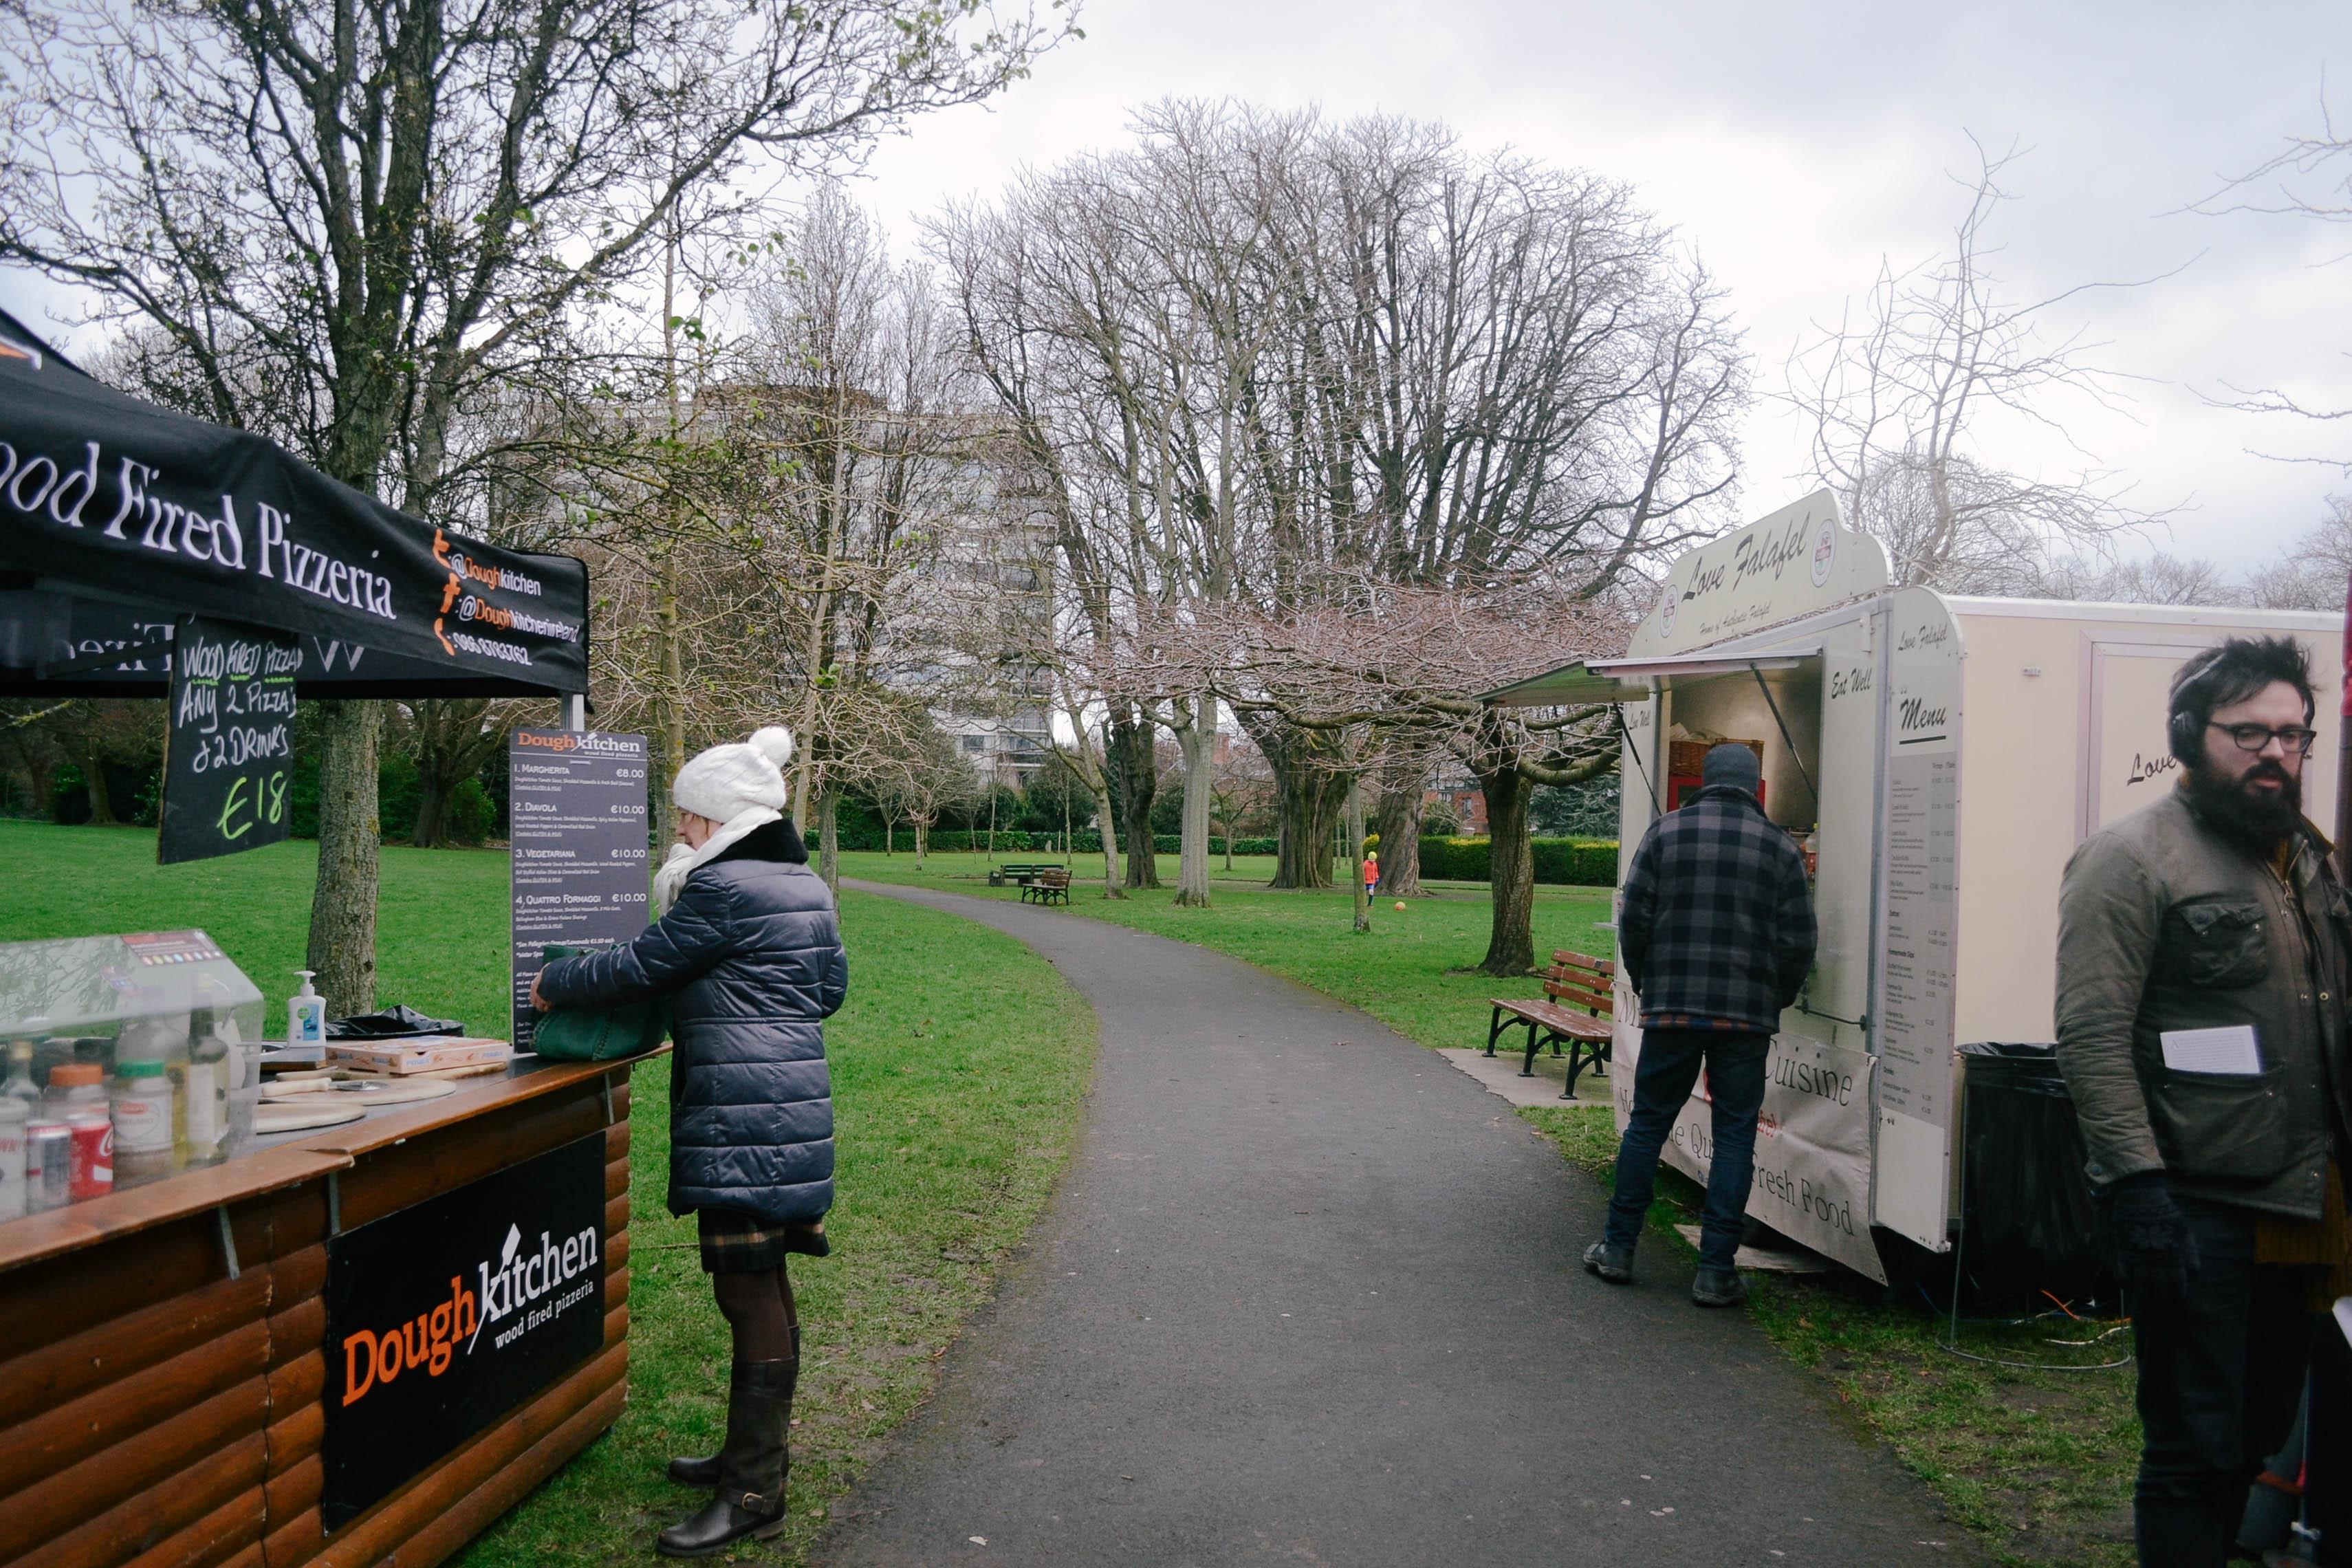 feira-comida-market-herbert-park-ballsbridge-passeio-domingo-sunday-food-park-dublin-ireland-irlanda-dicas_-9